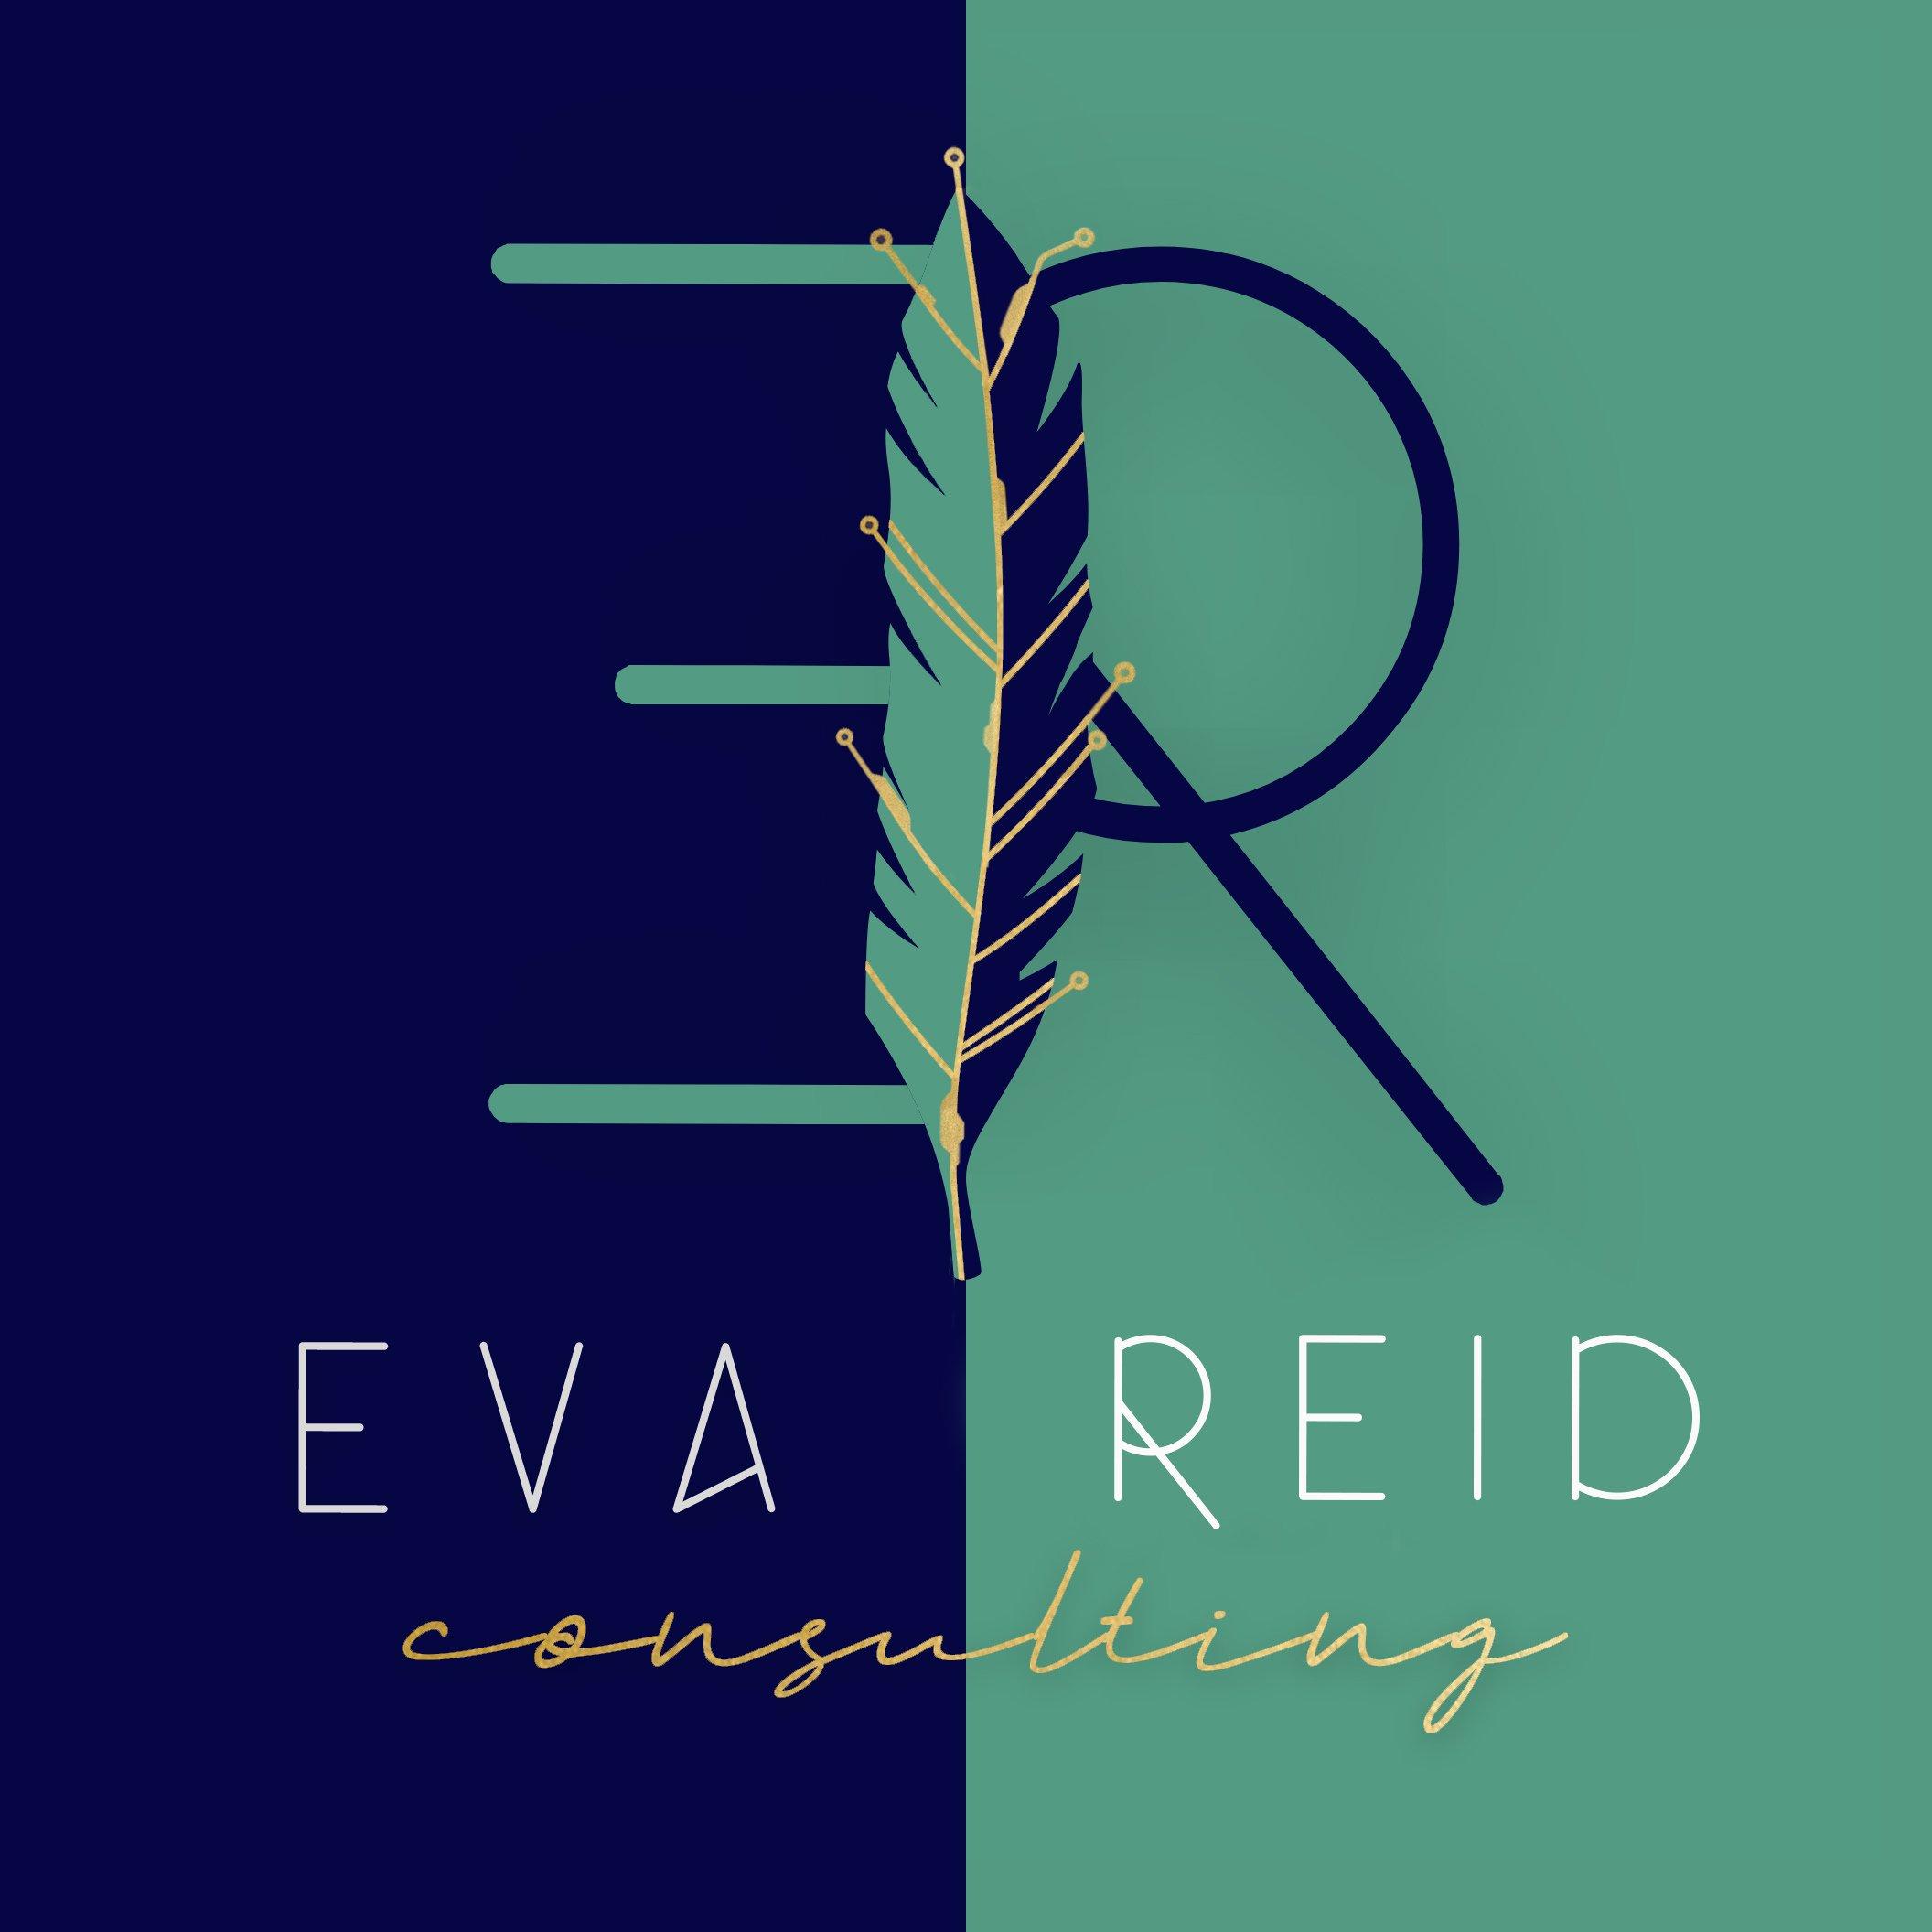 custom creative artistic logo design consulting feather technology eva reid